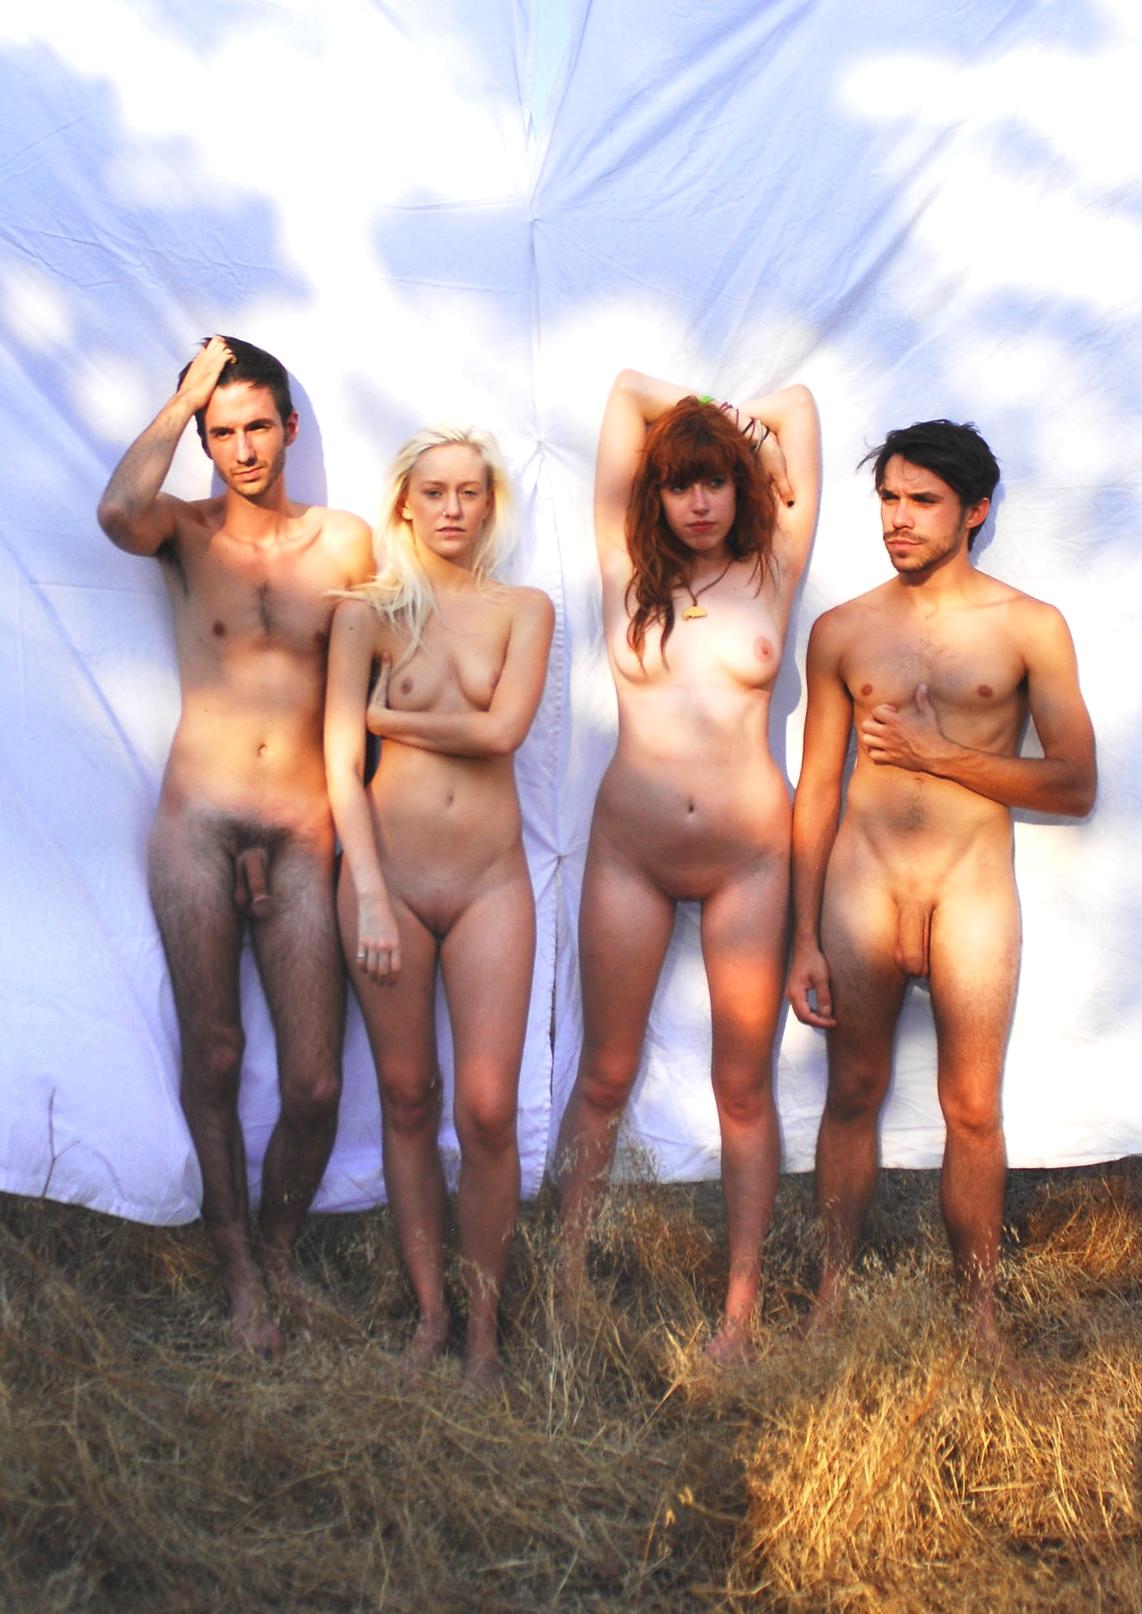 Familie nackt in sauna